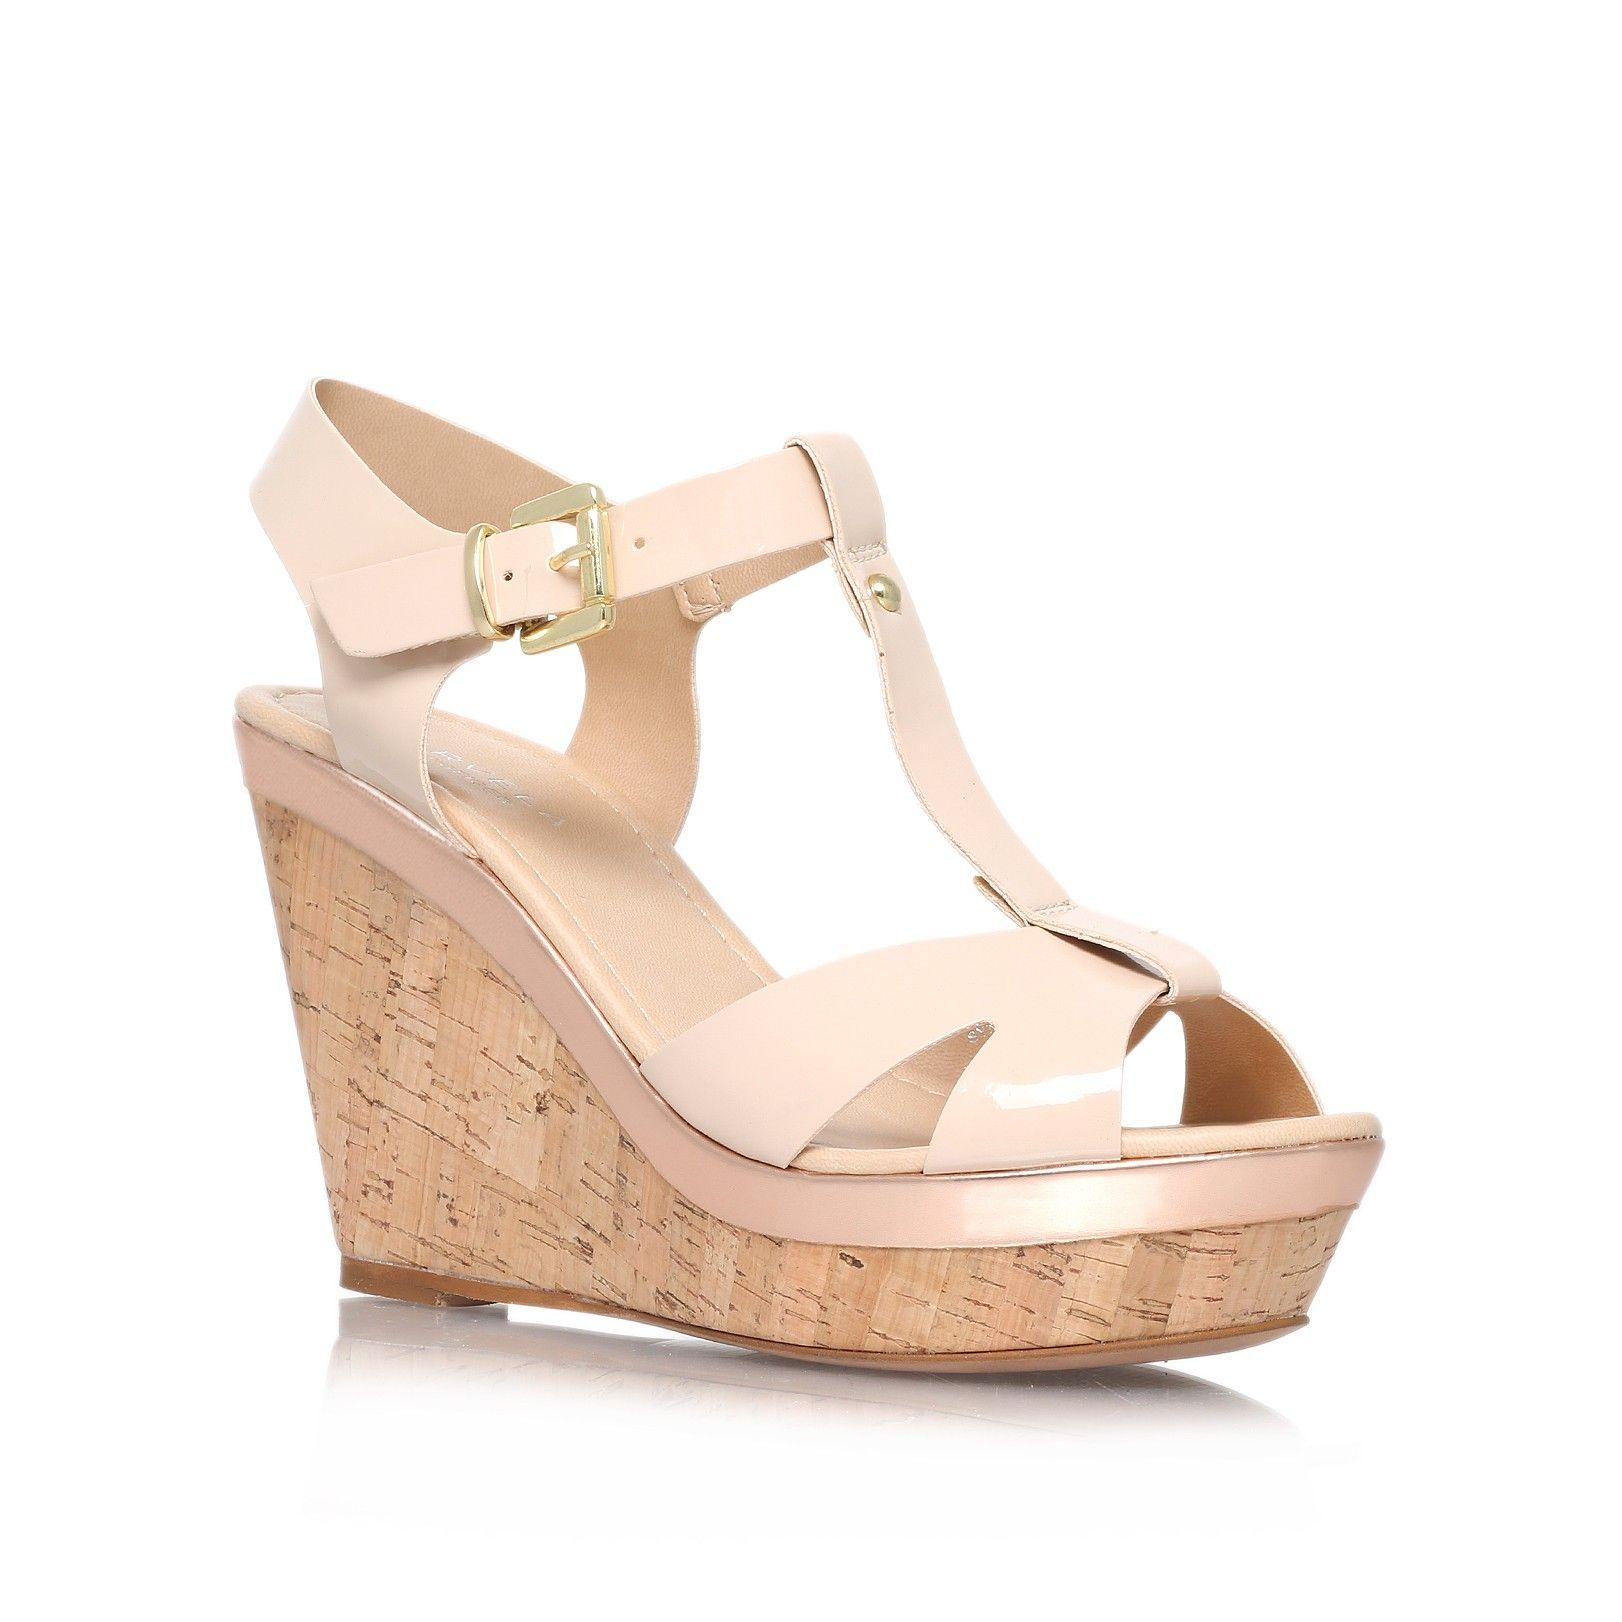 kabby nude high heel wedge sandals from Carvela Kurt Geiger ...